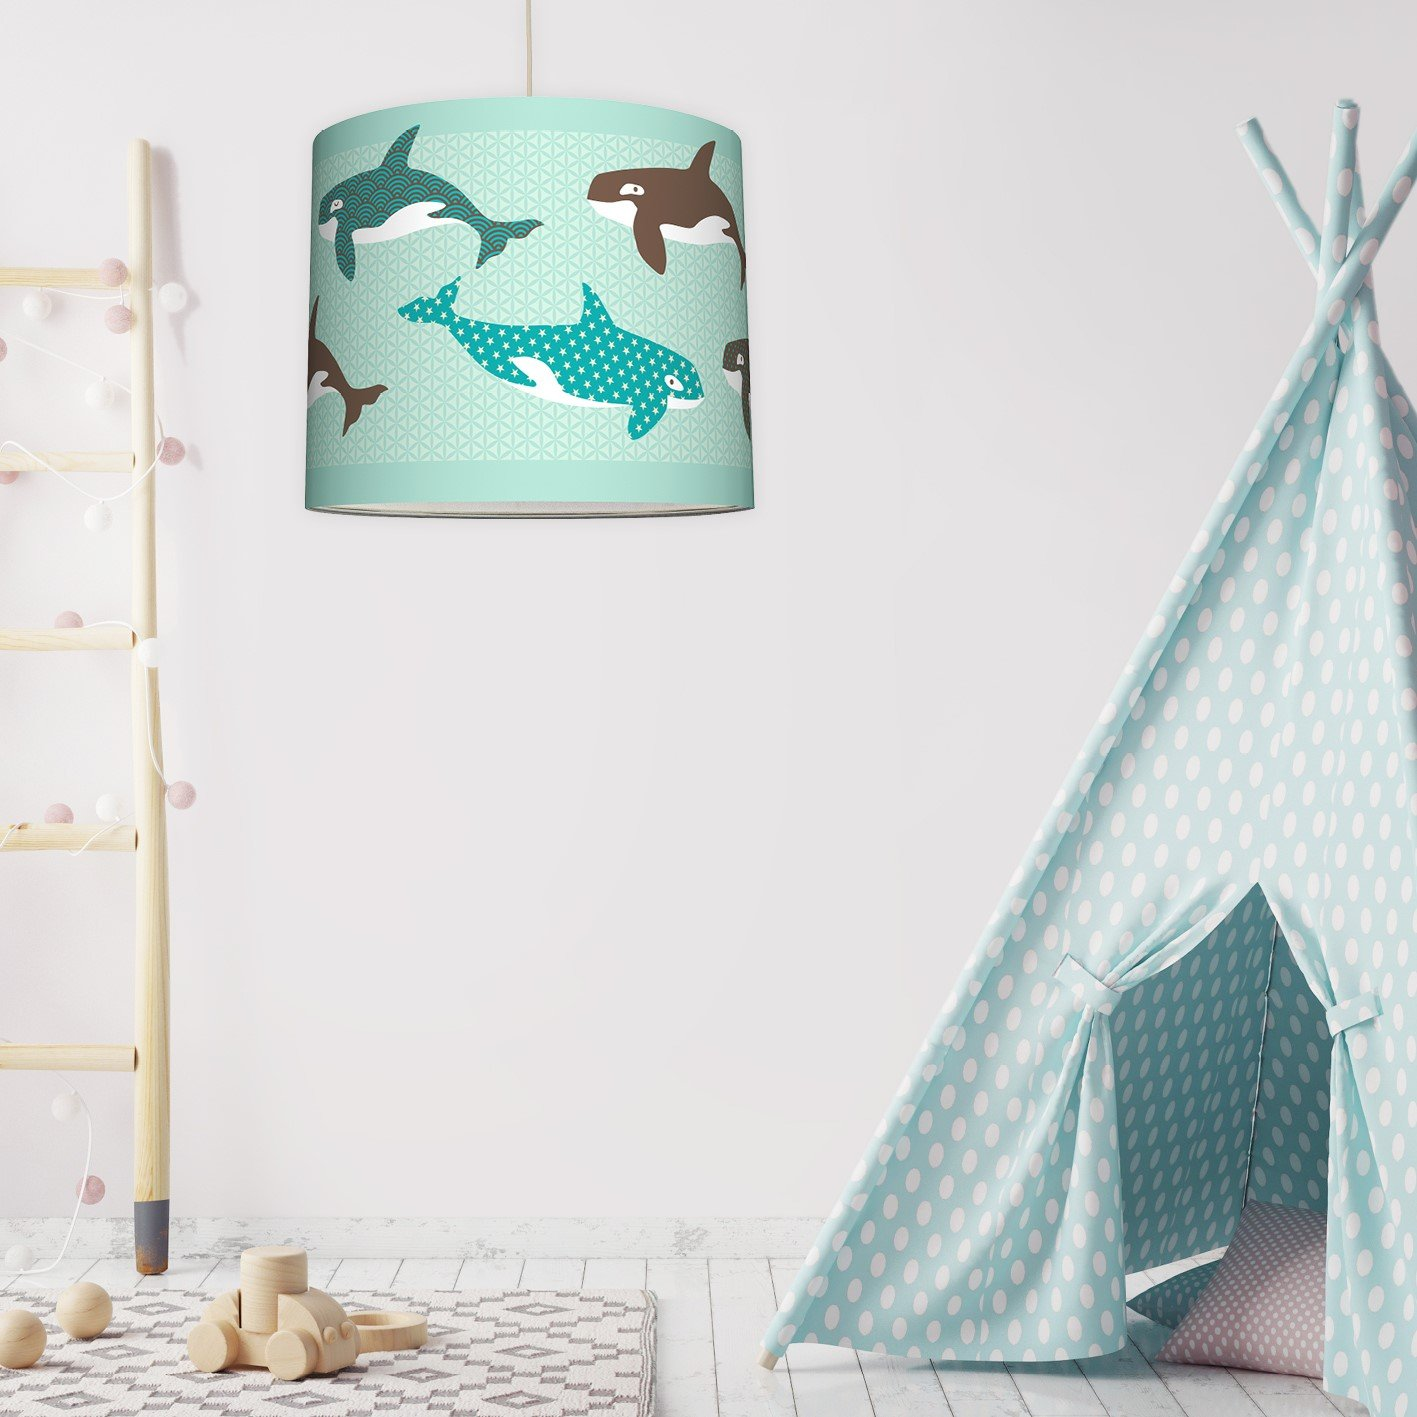 Anna Wand Lampenschirm Little Wood Schirm Fur Kinder Baby Lampe